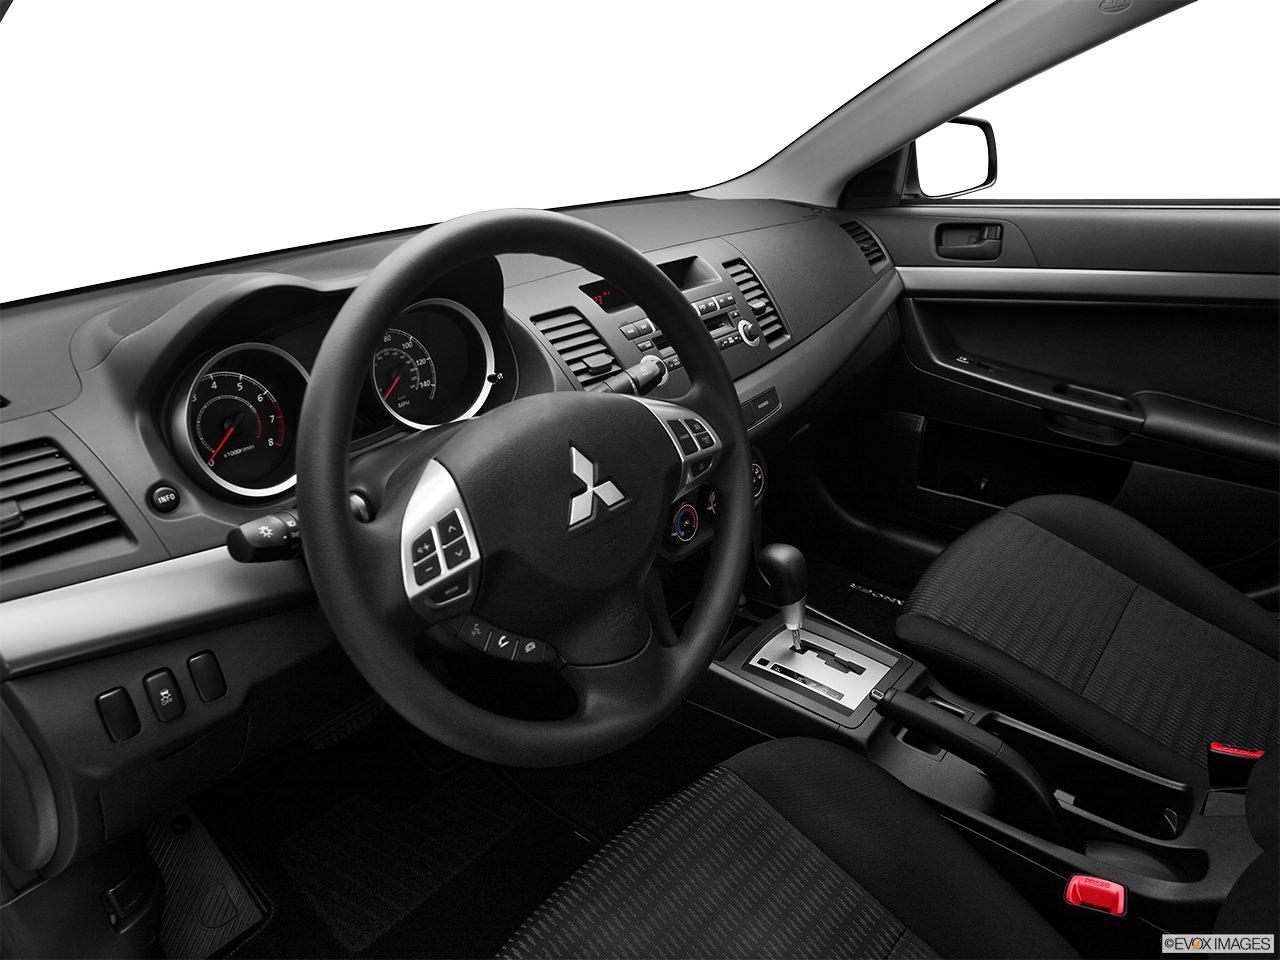 Mitsubishi Lancer 2012 Interior